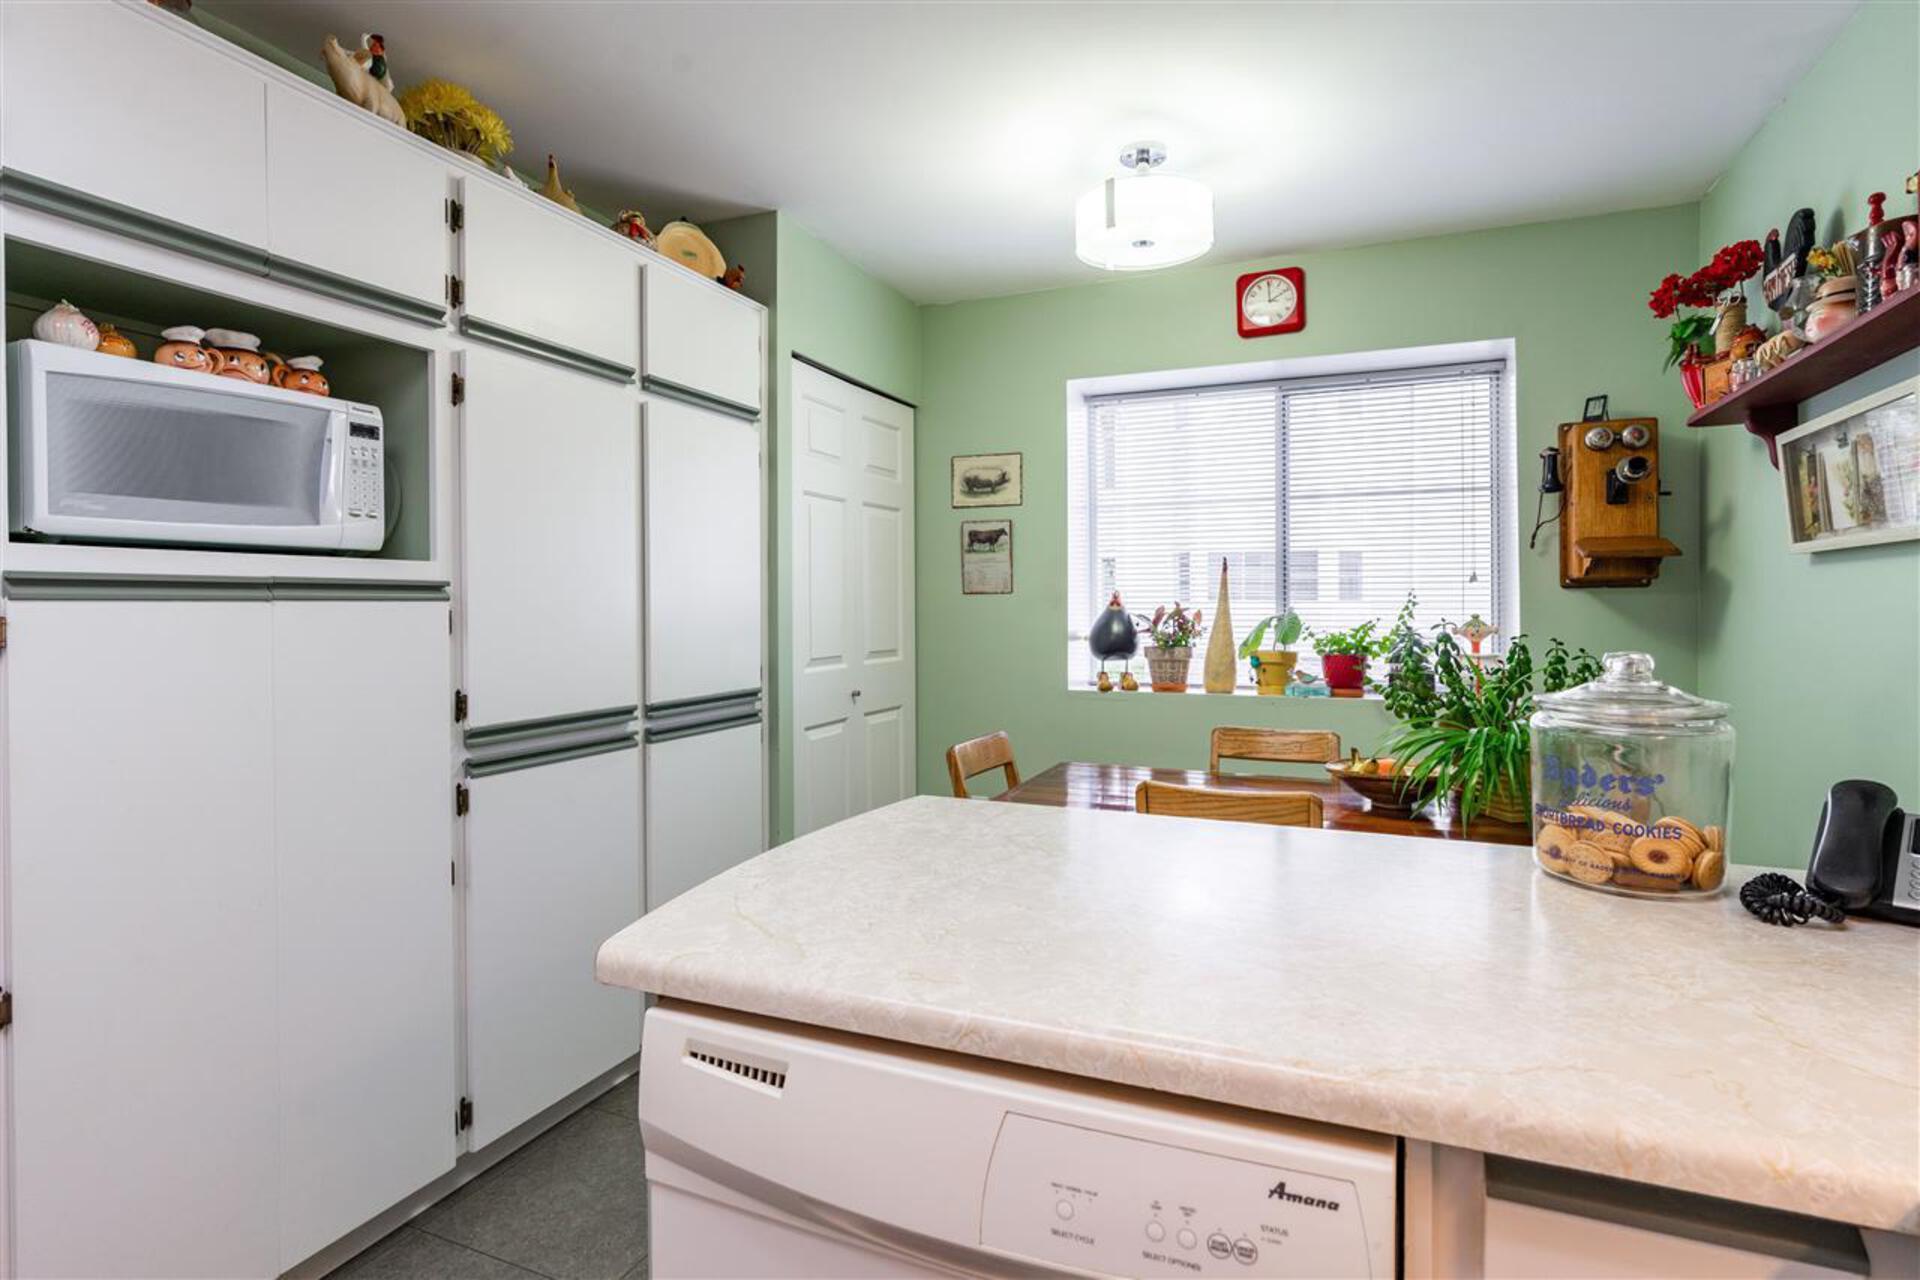 1318-brunette-avenue-maillardville-coquitlam-14 of 1 - 1318 Brunette Avenue, Maillardville, Coquitlam